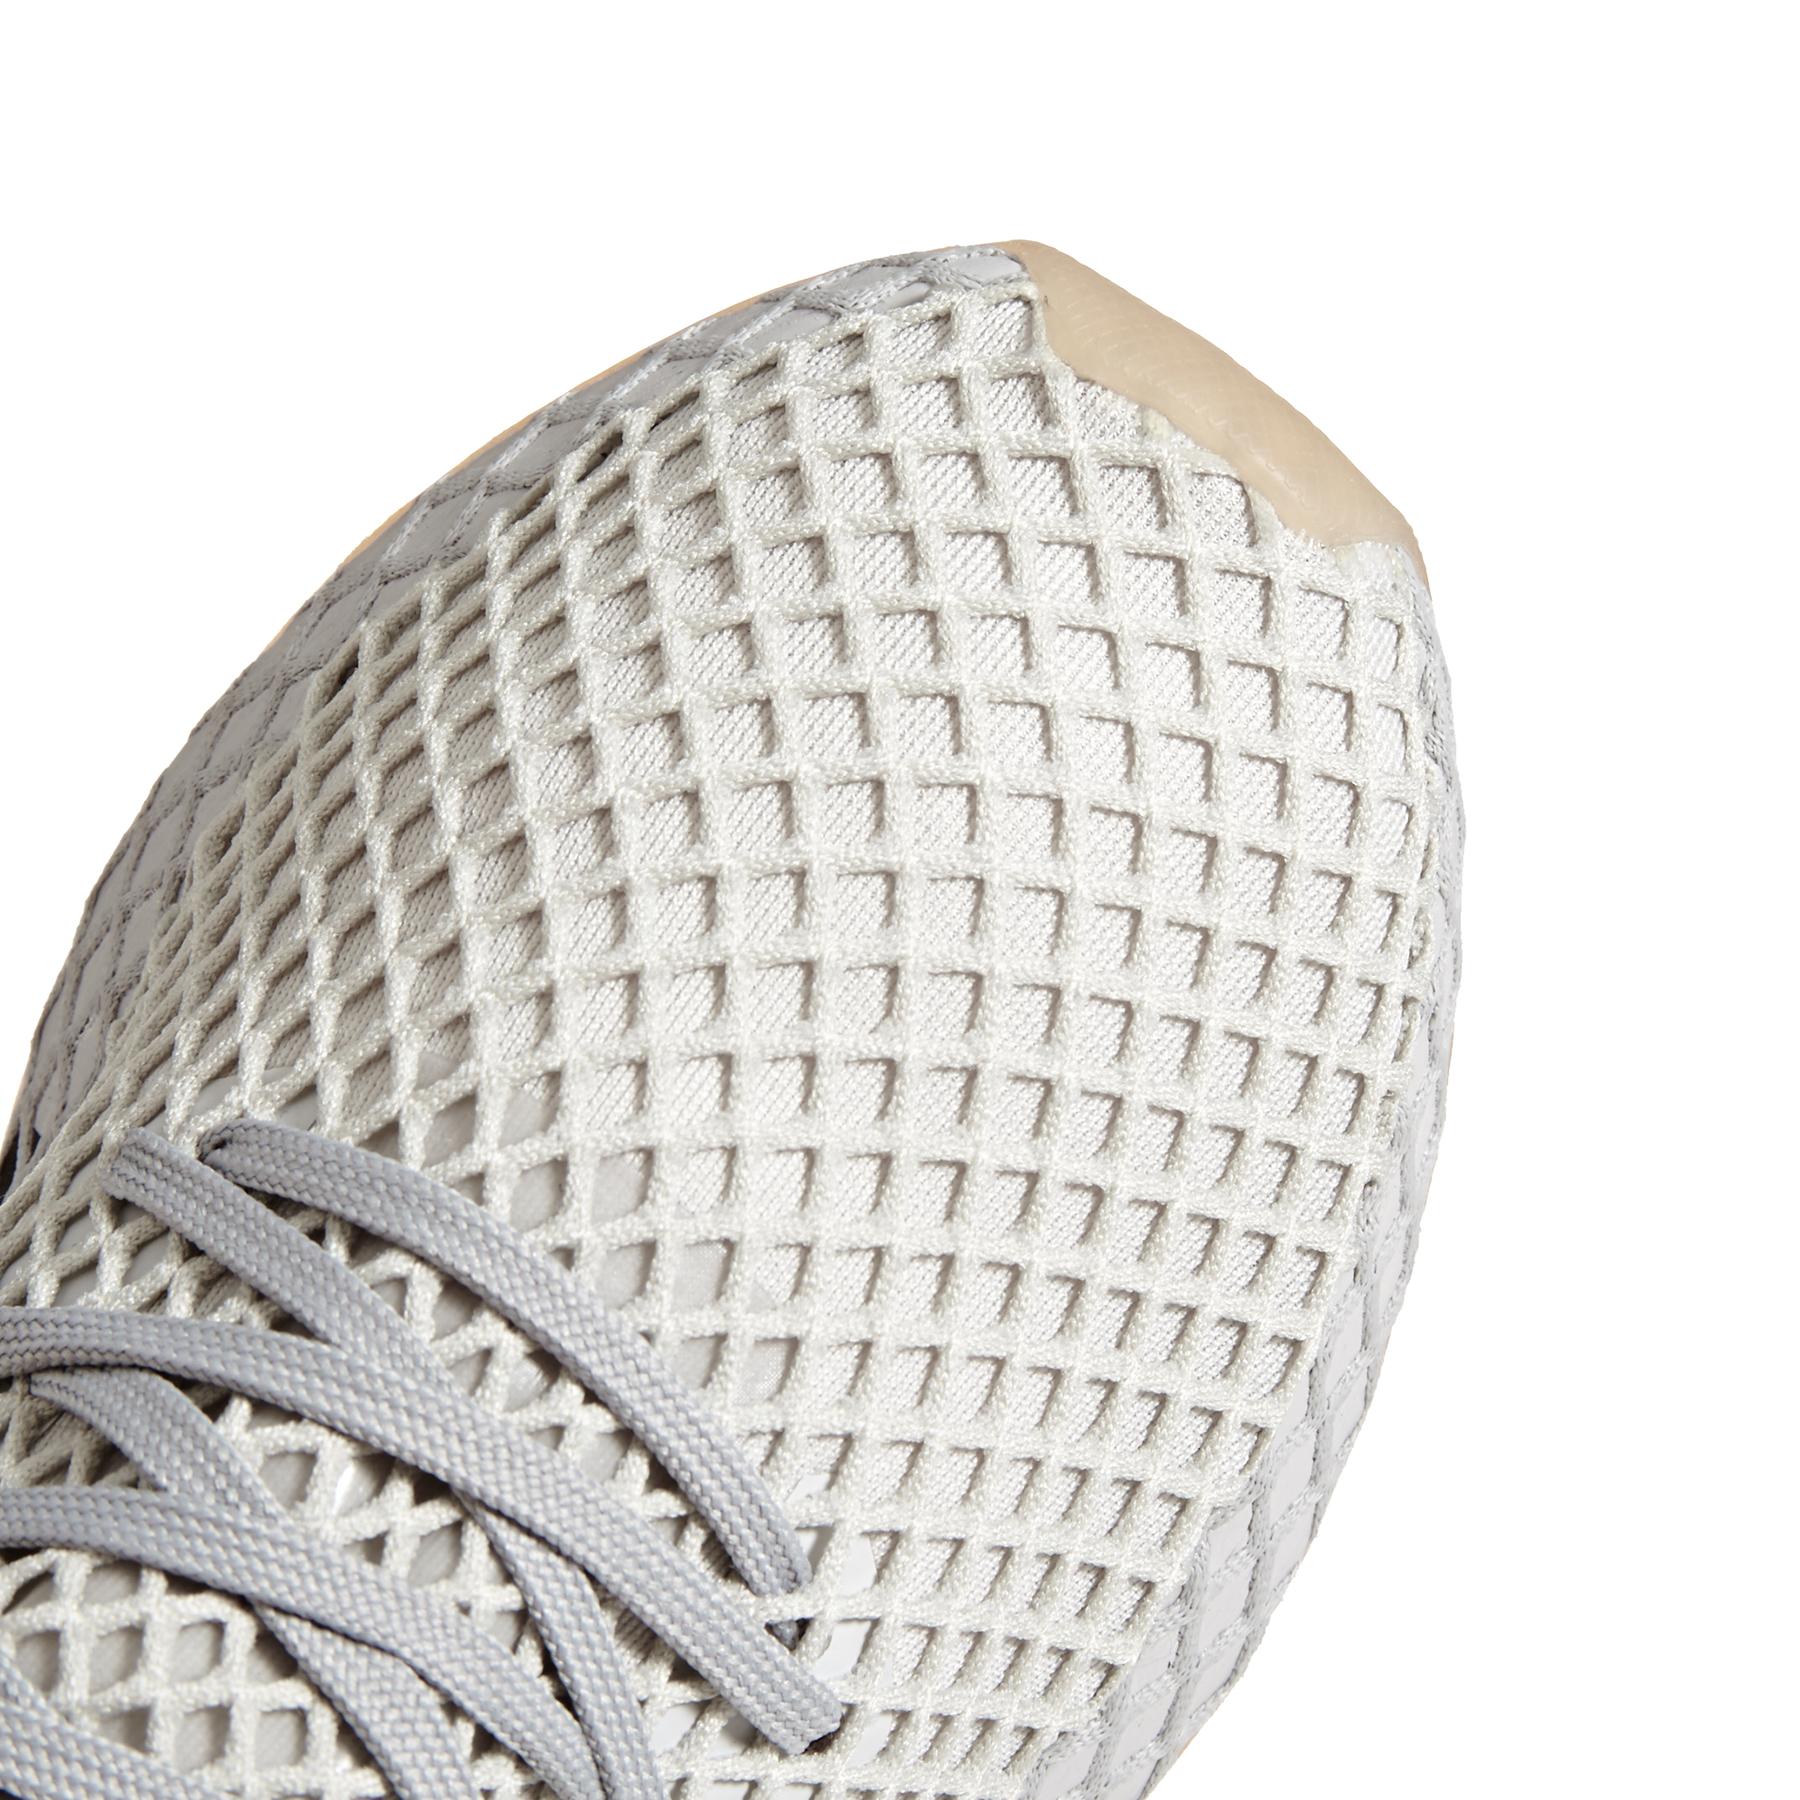 adidas originals DEERUPT RUNNER GREY THREE F17lgh solid greyGUM 1 bei